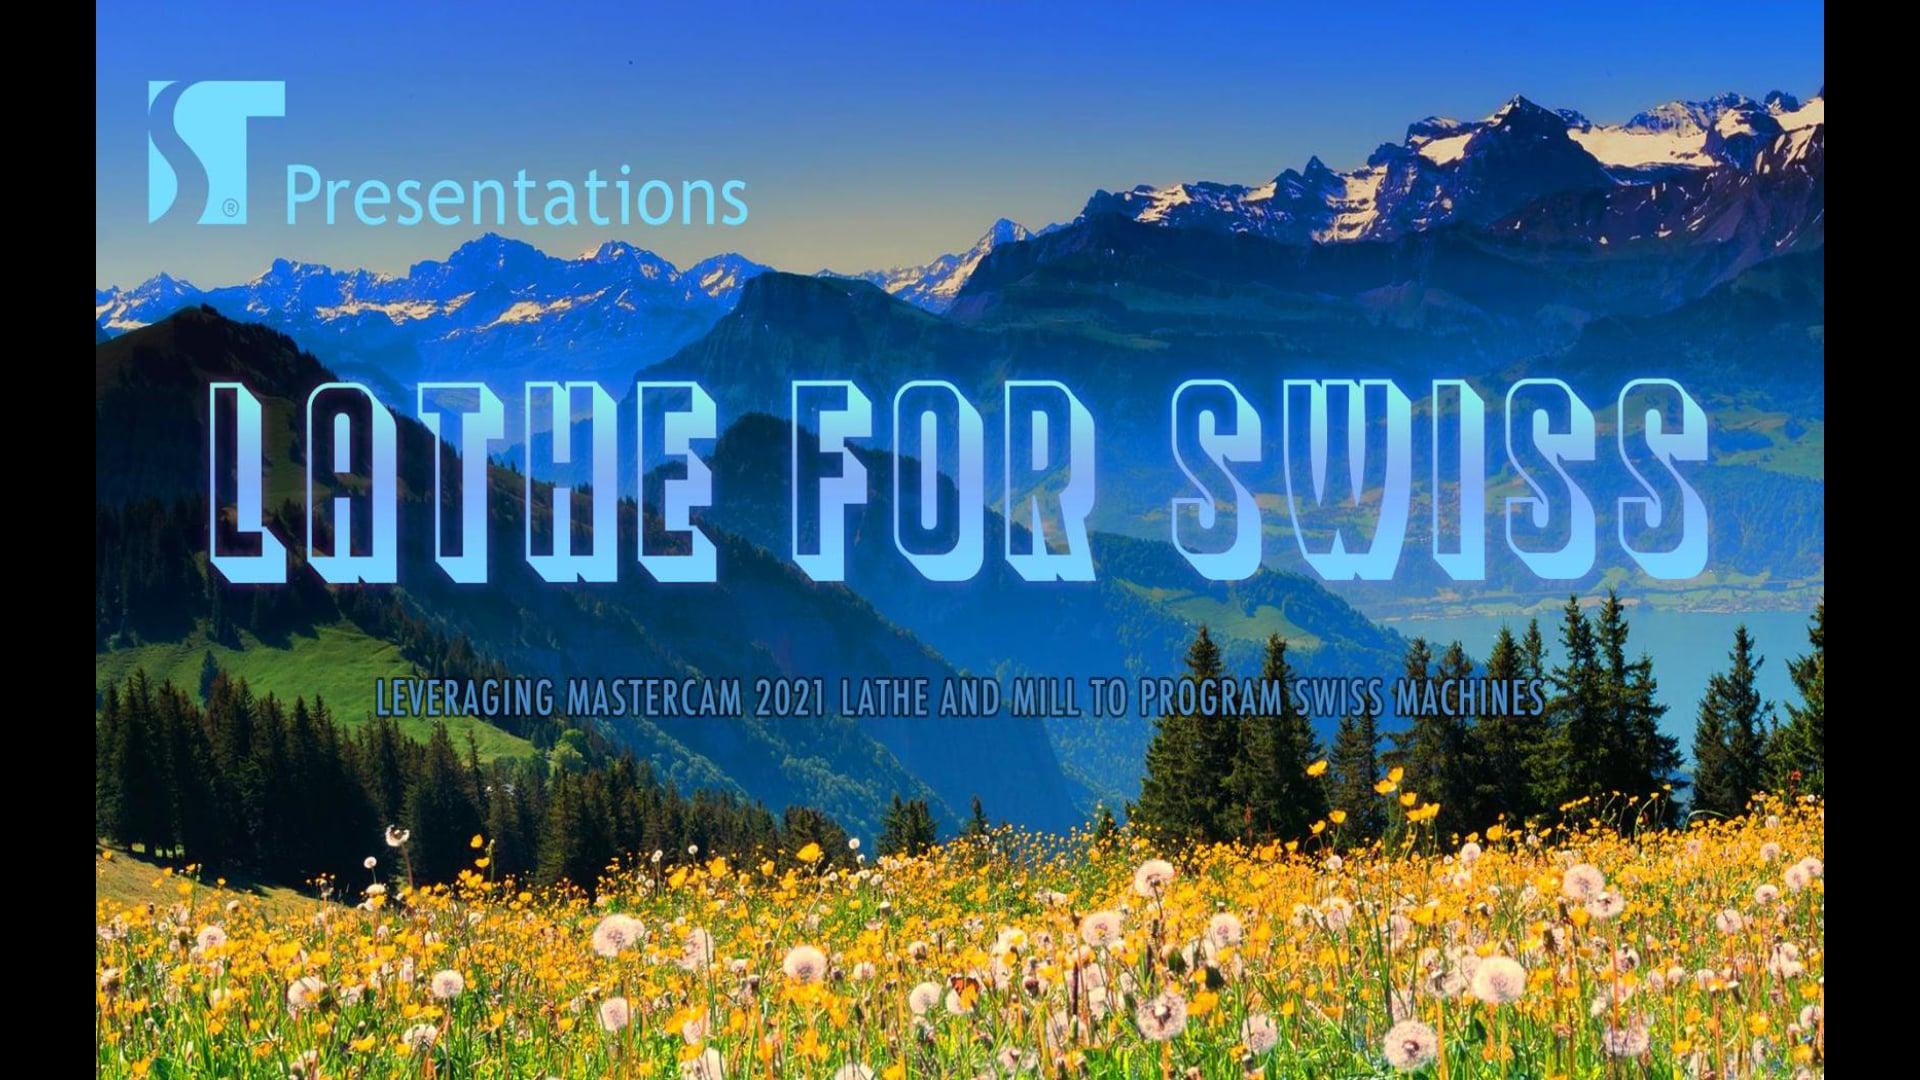 Mastercam Lathe for Swiss